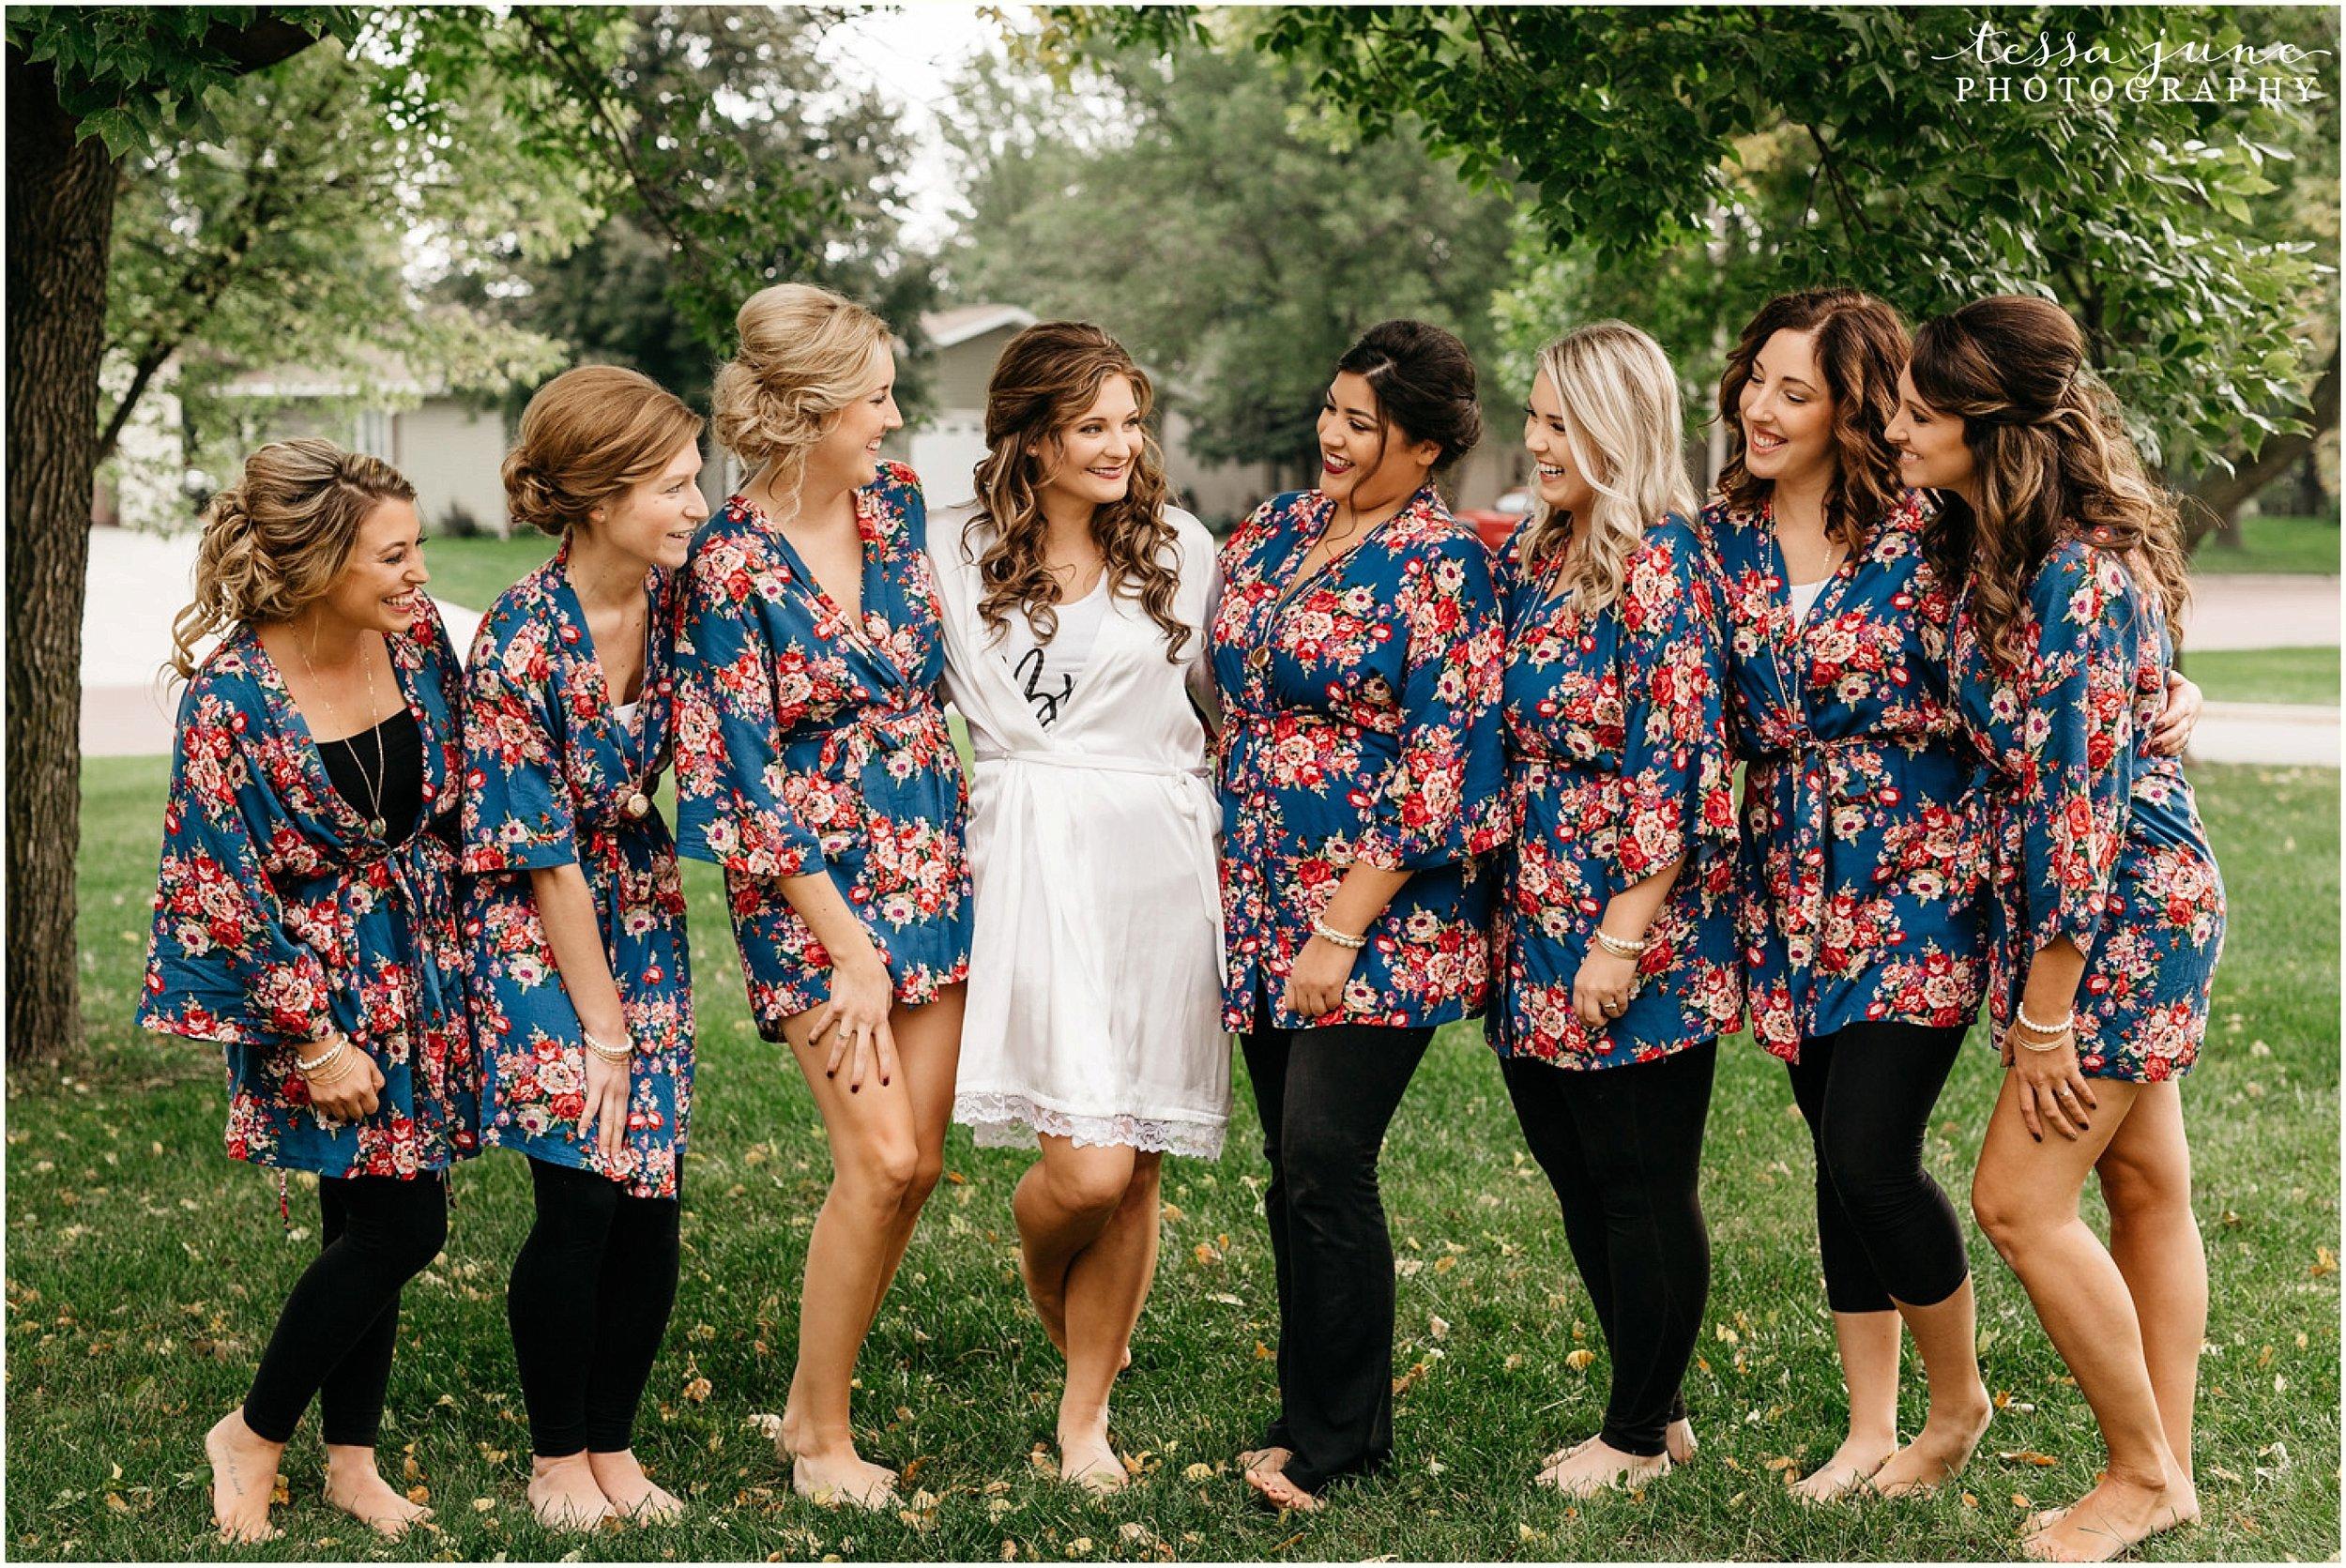 bohemian-minnesota-wedding-mismatched-bridesmaid-dresses-waterfall-st-cloud-tessa-june-photography-20.jpg